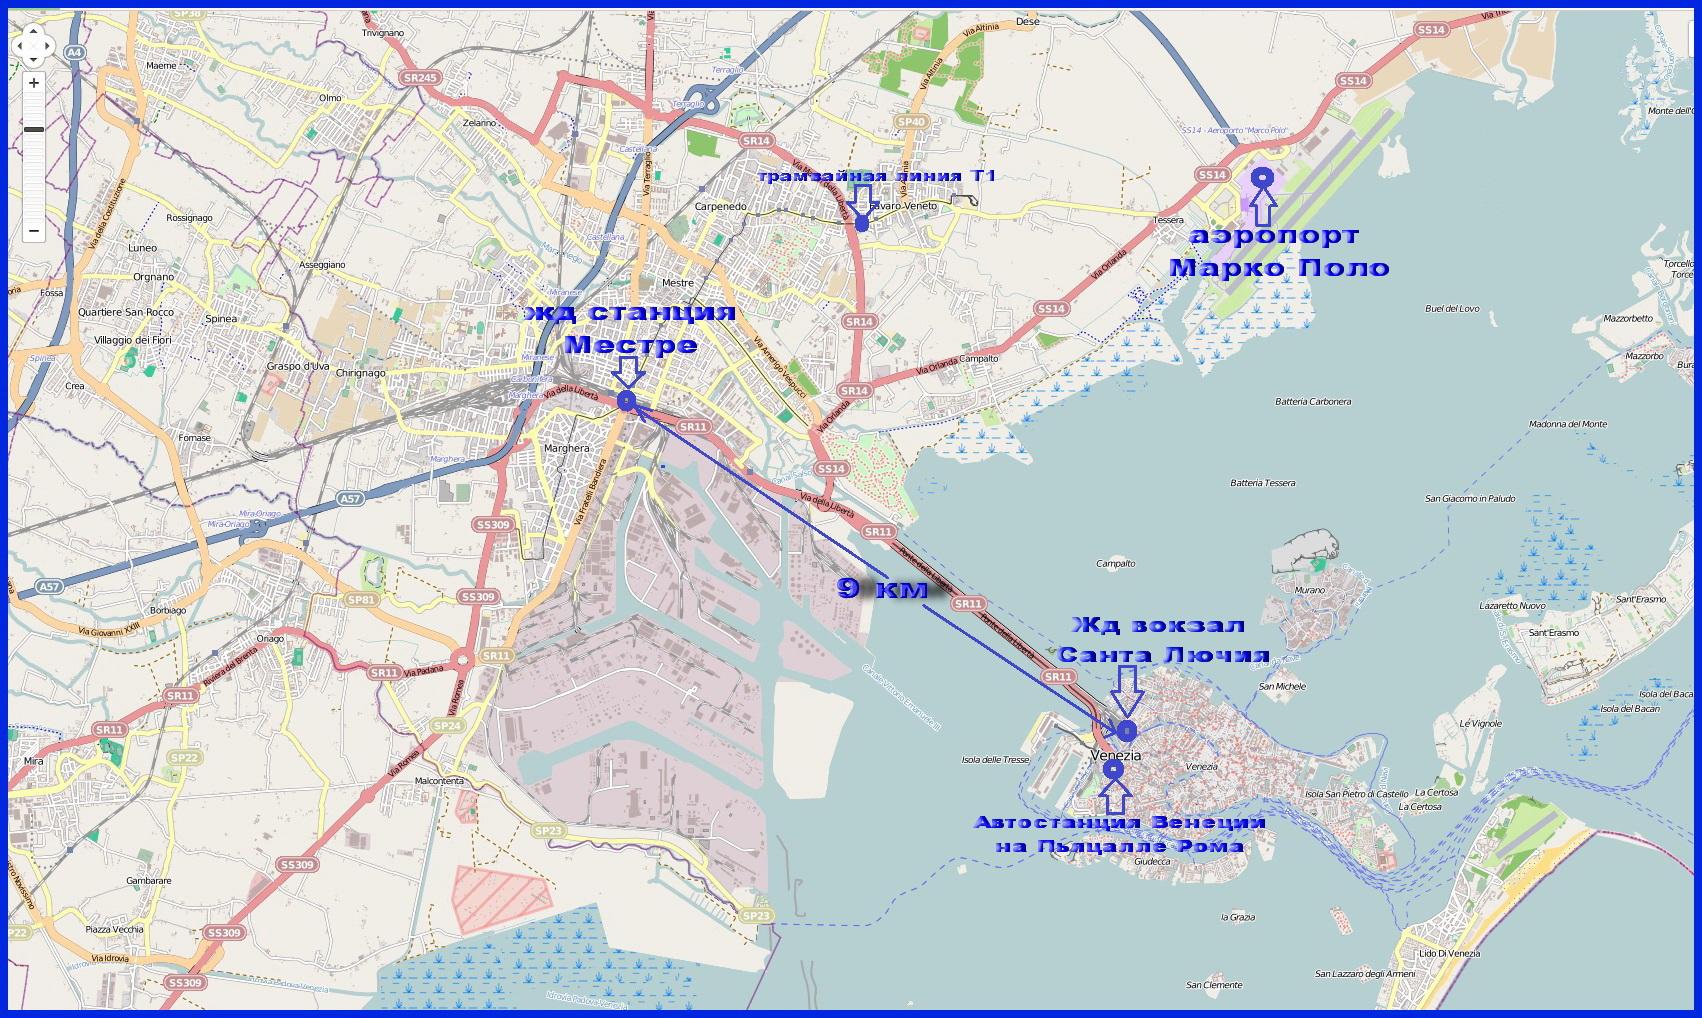 Жд вокзалы Венеции и Местре на карте